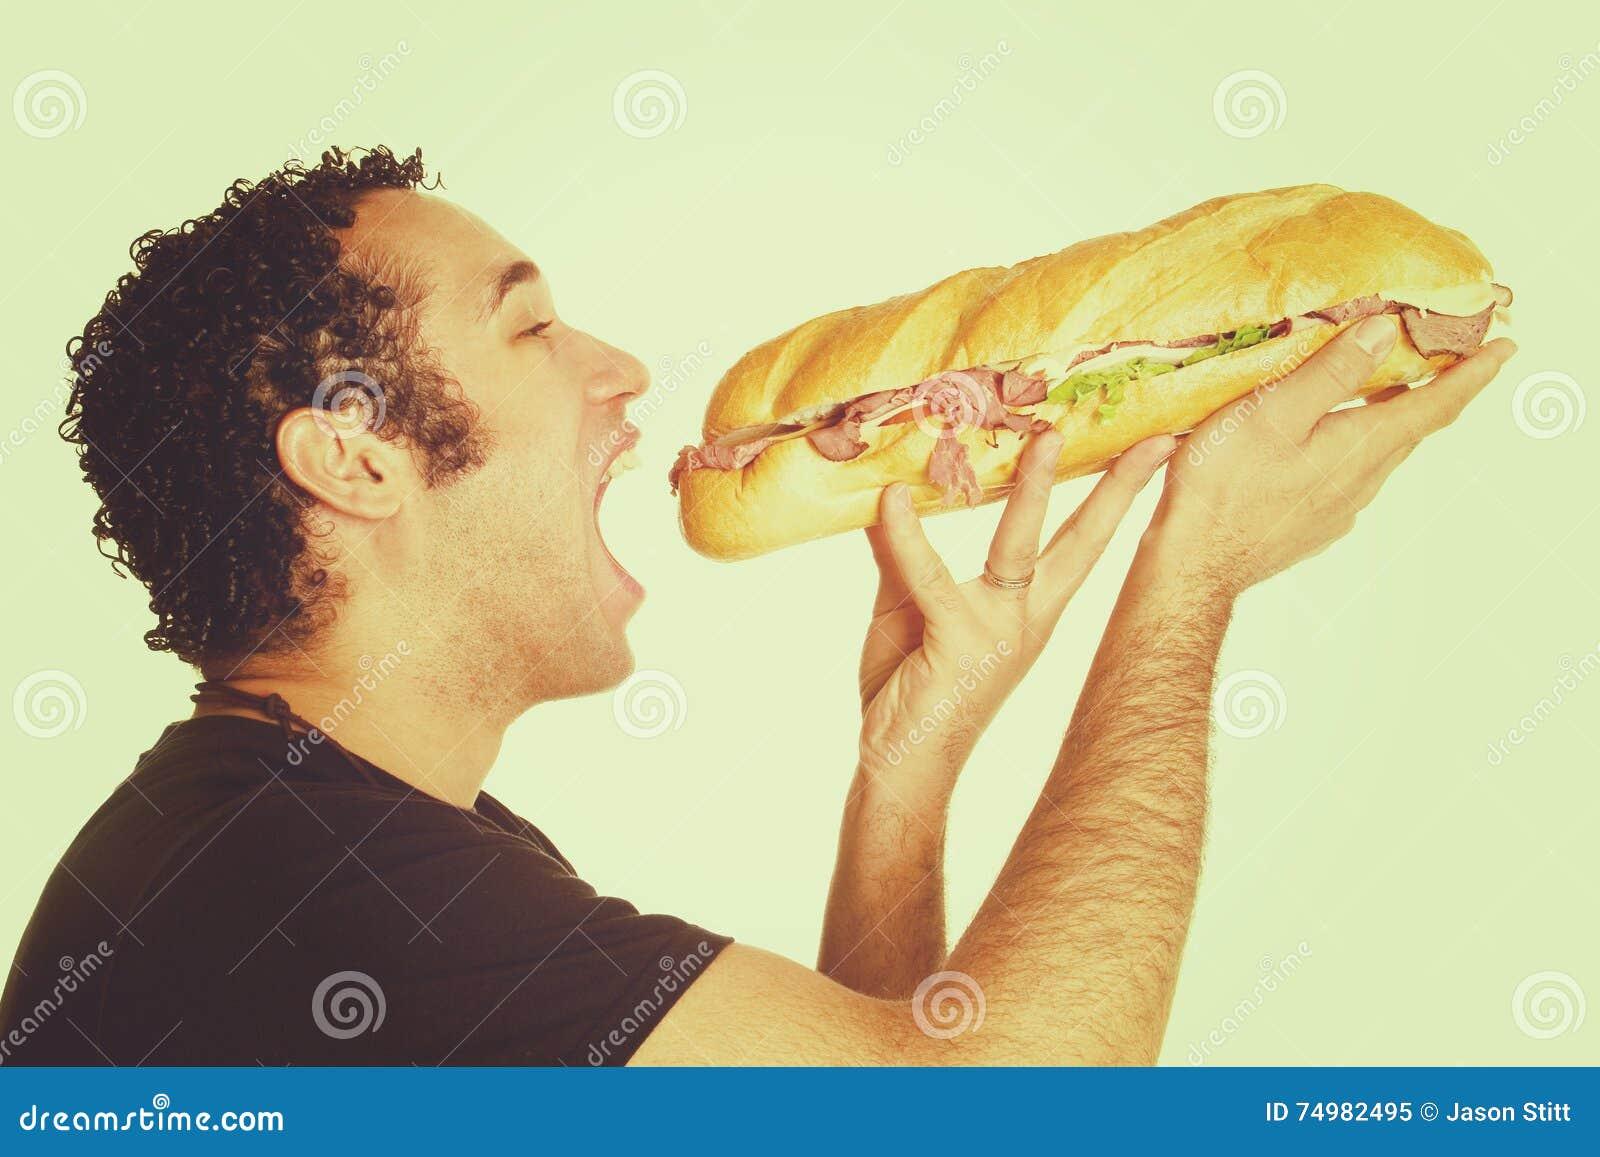 Panino mangiatore di uomini